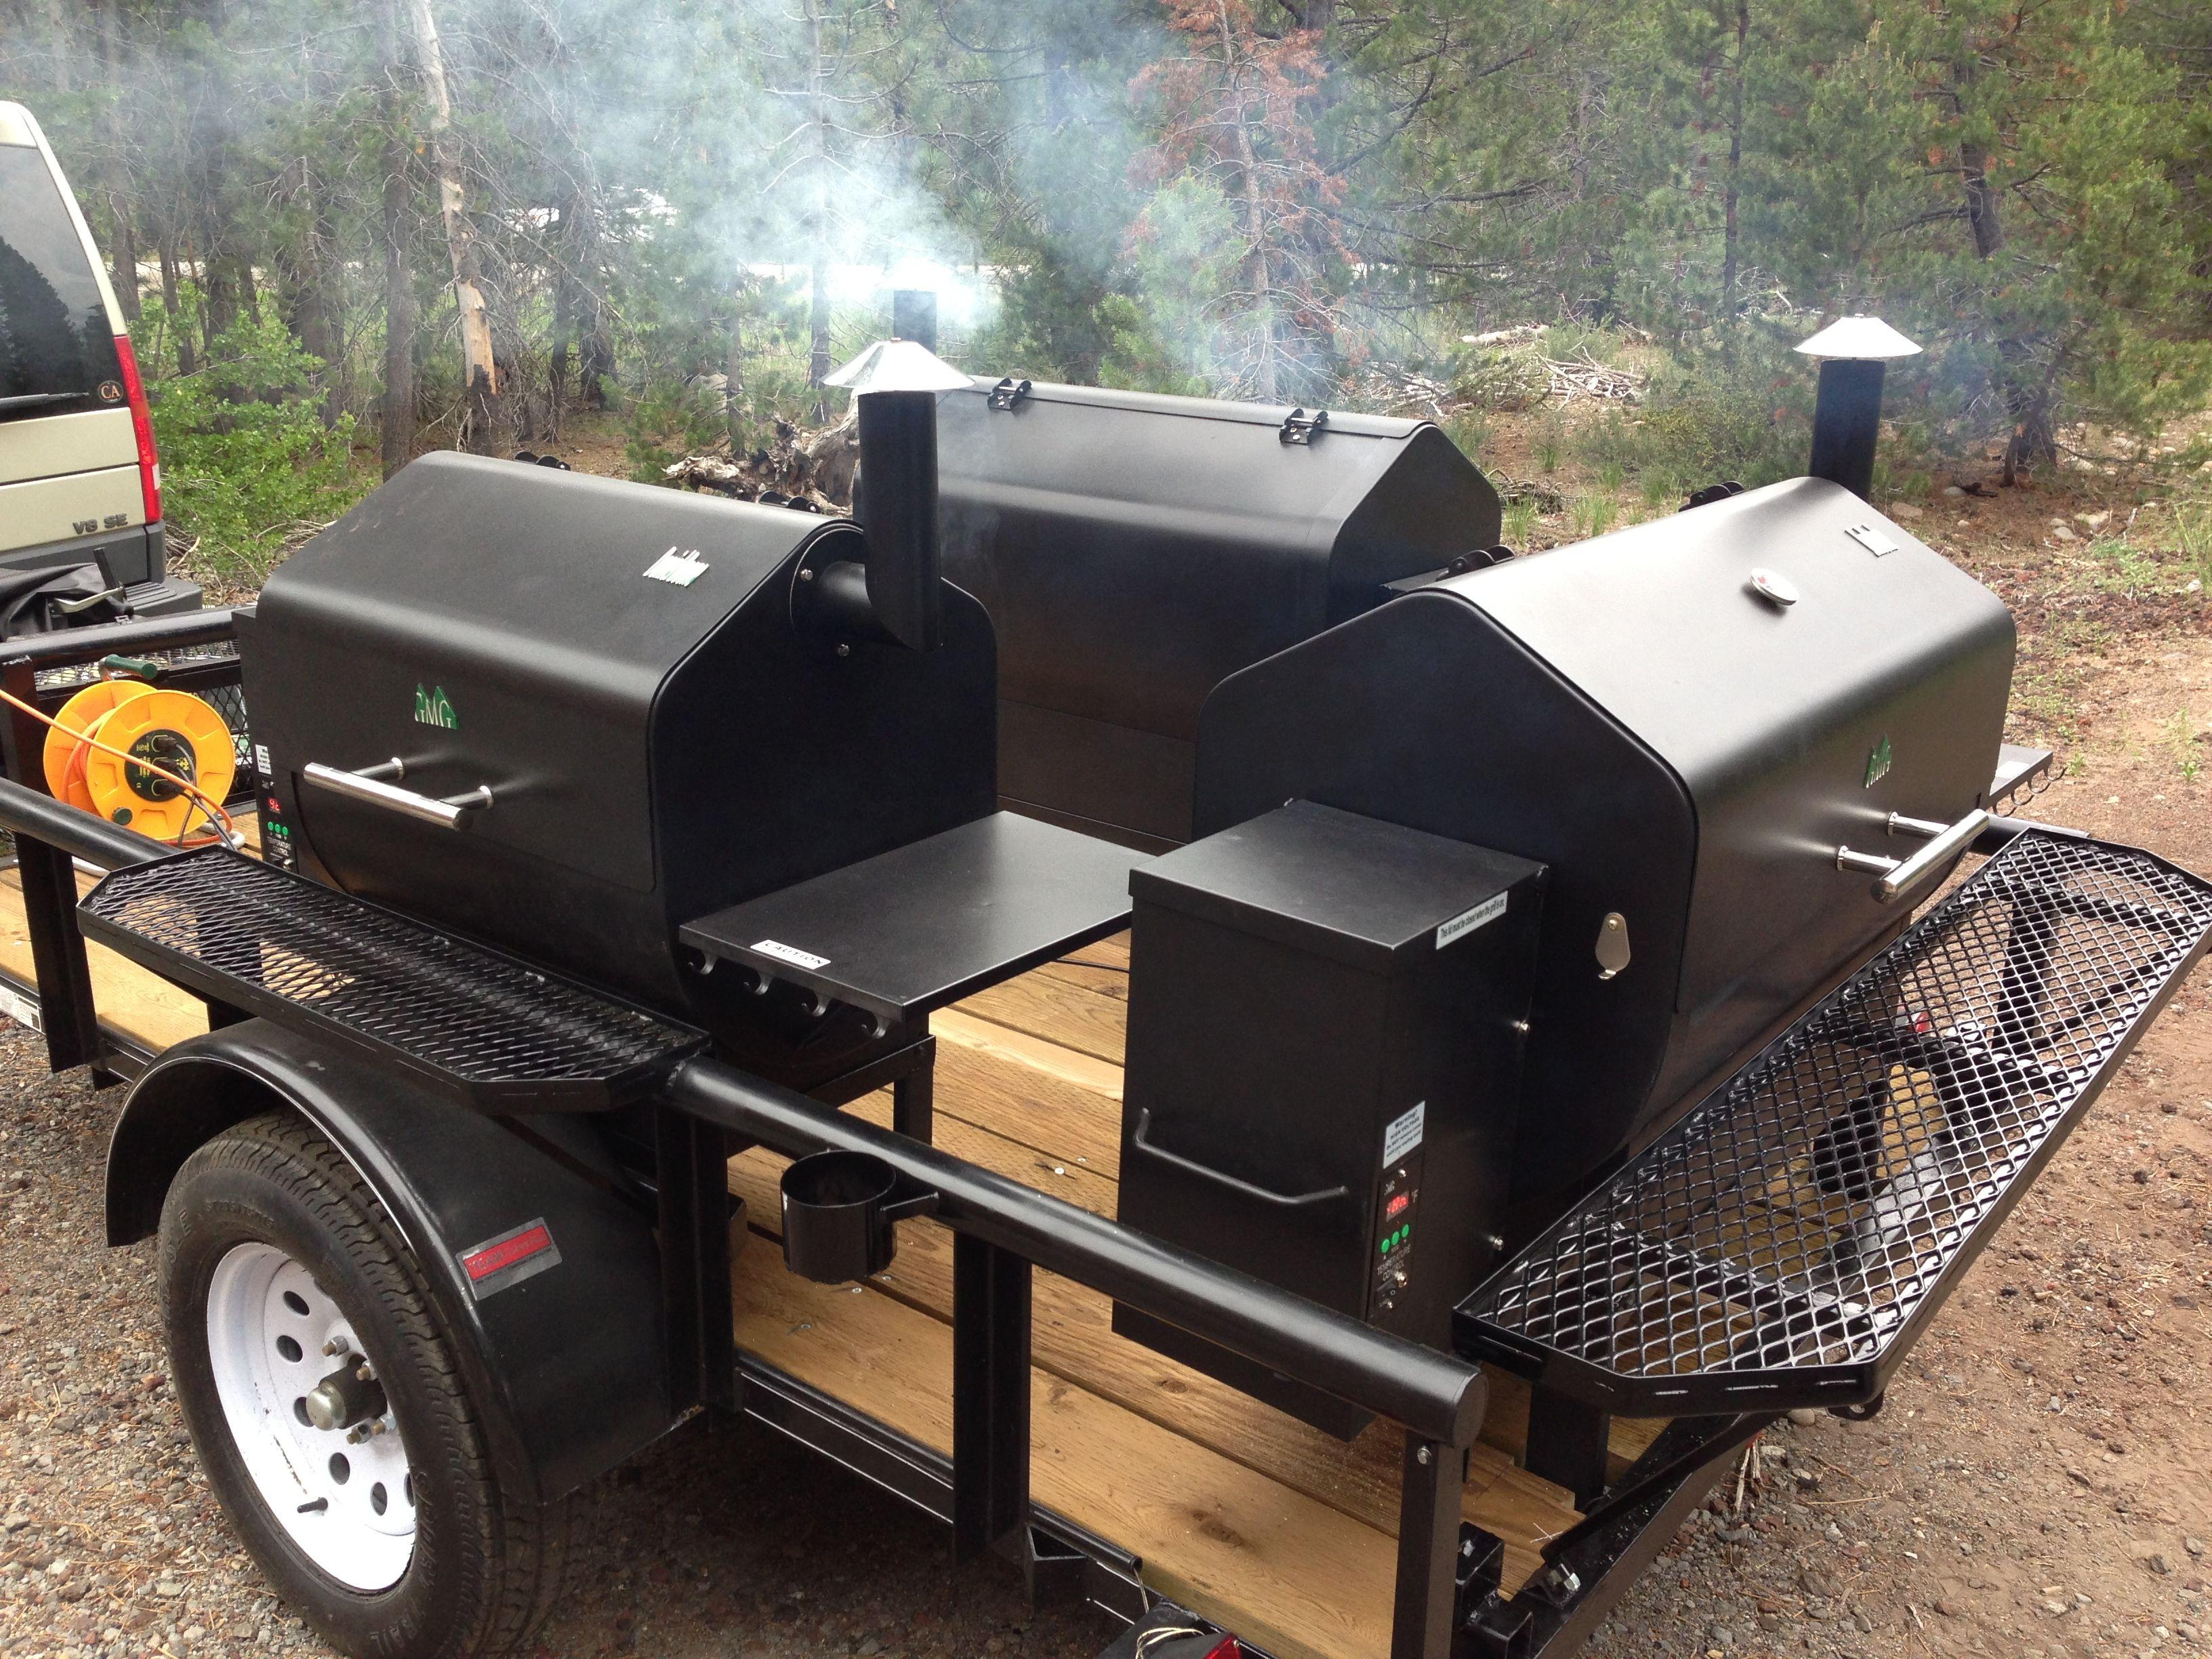 Tahoe Pellet Grills and Big Blue Q's new BBQ Trailer